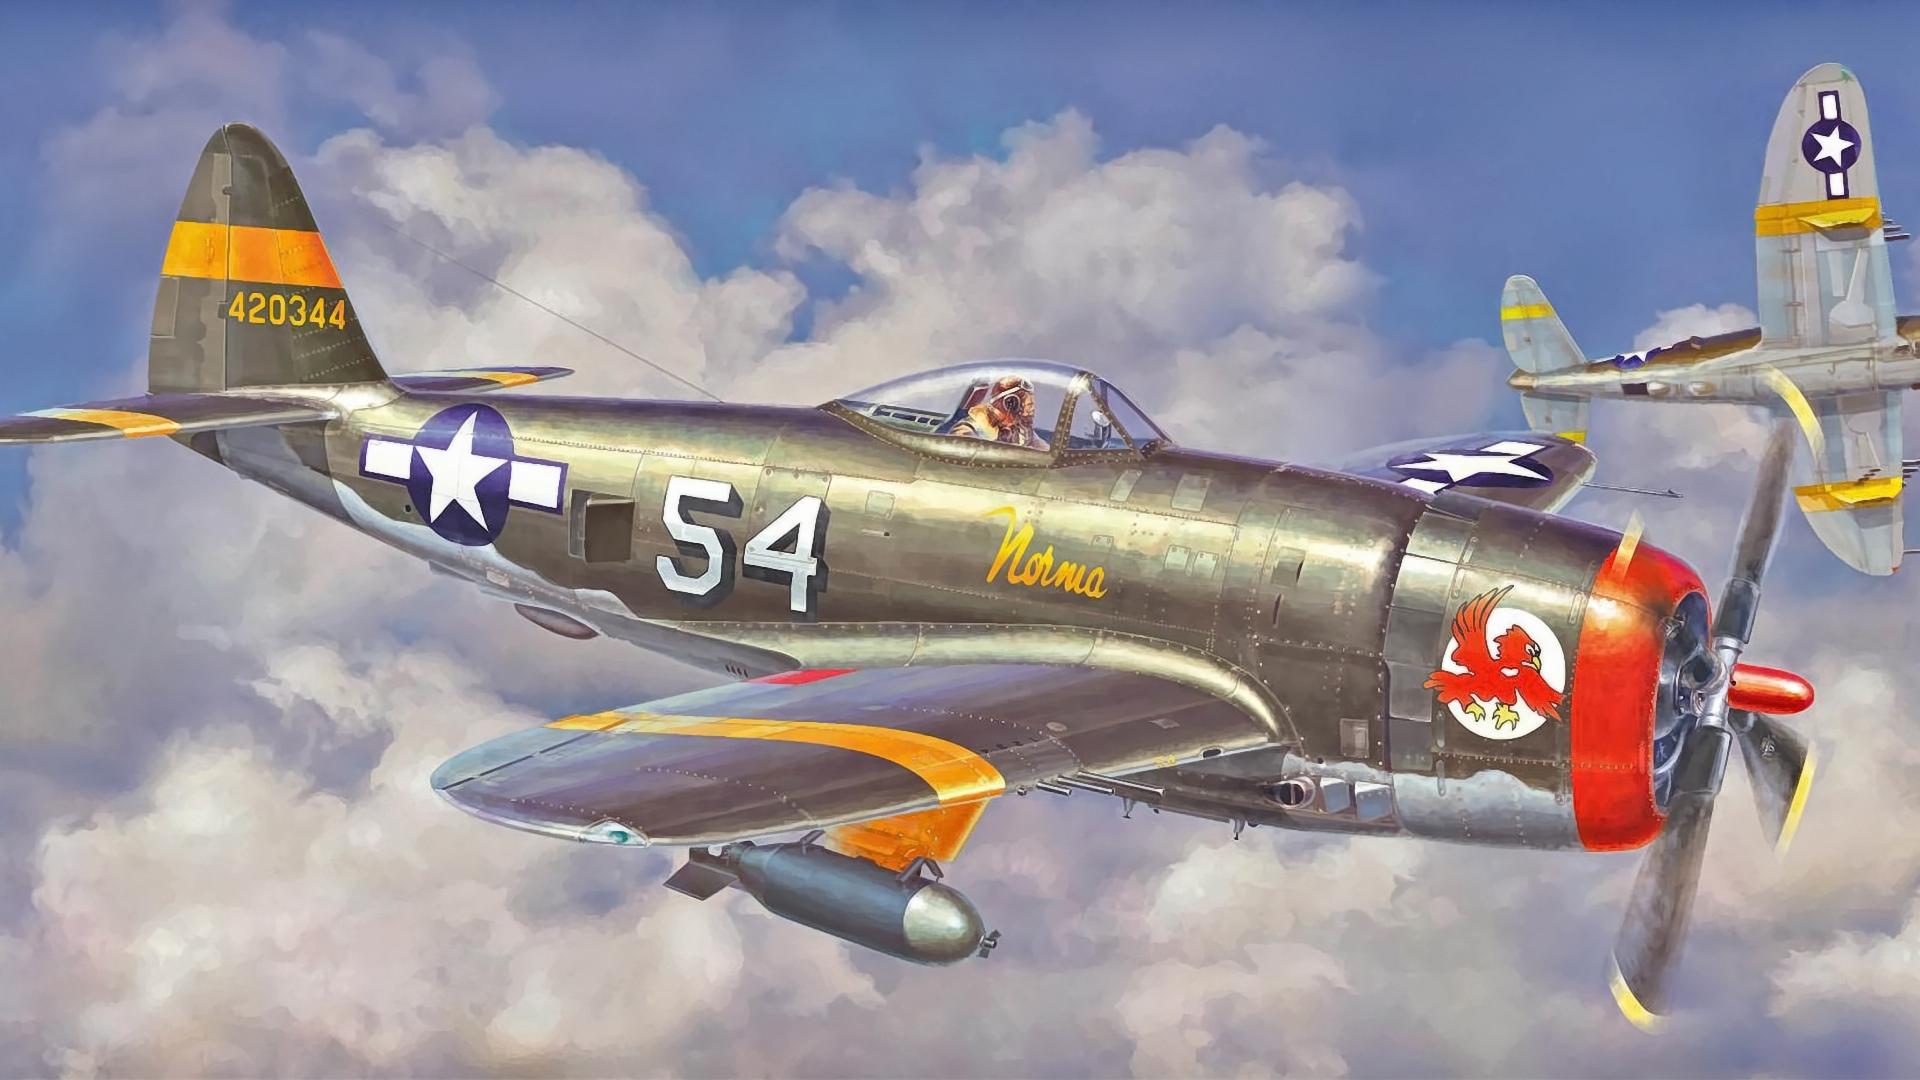 Download wallpaper 1920x1080 p 47 thunderbolt hasegawa fighter 1920x1080